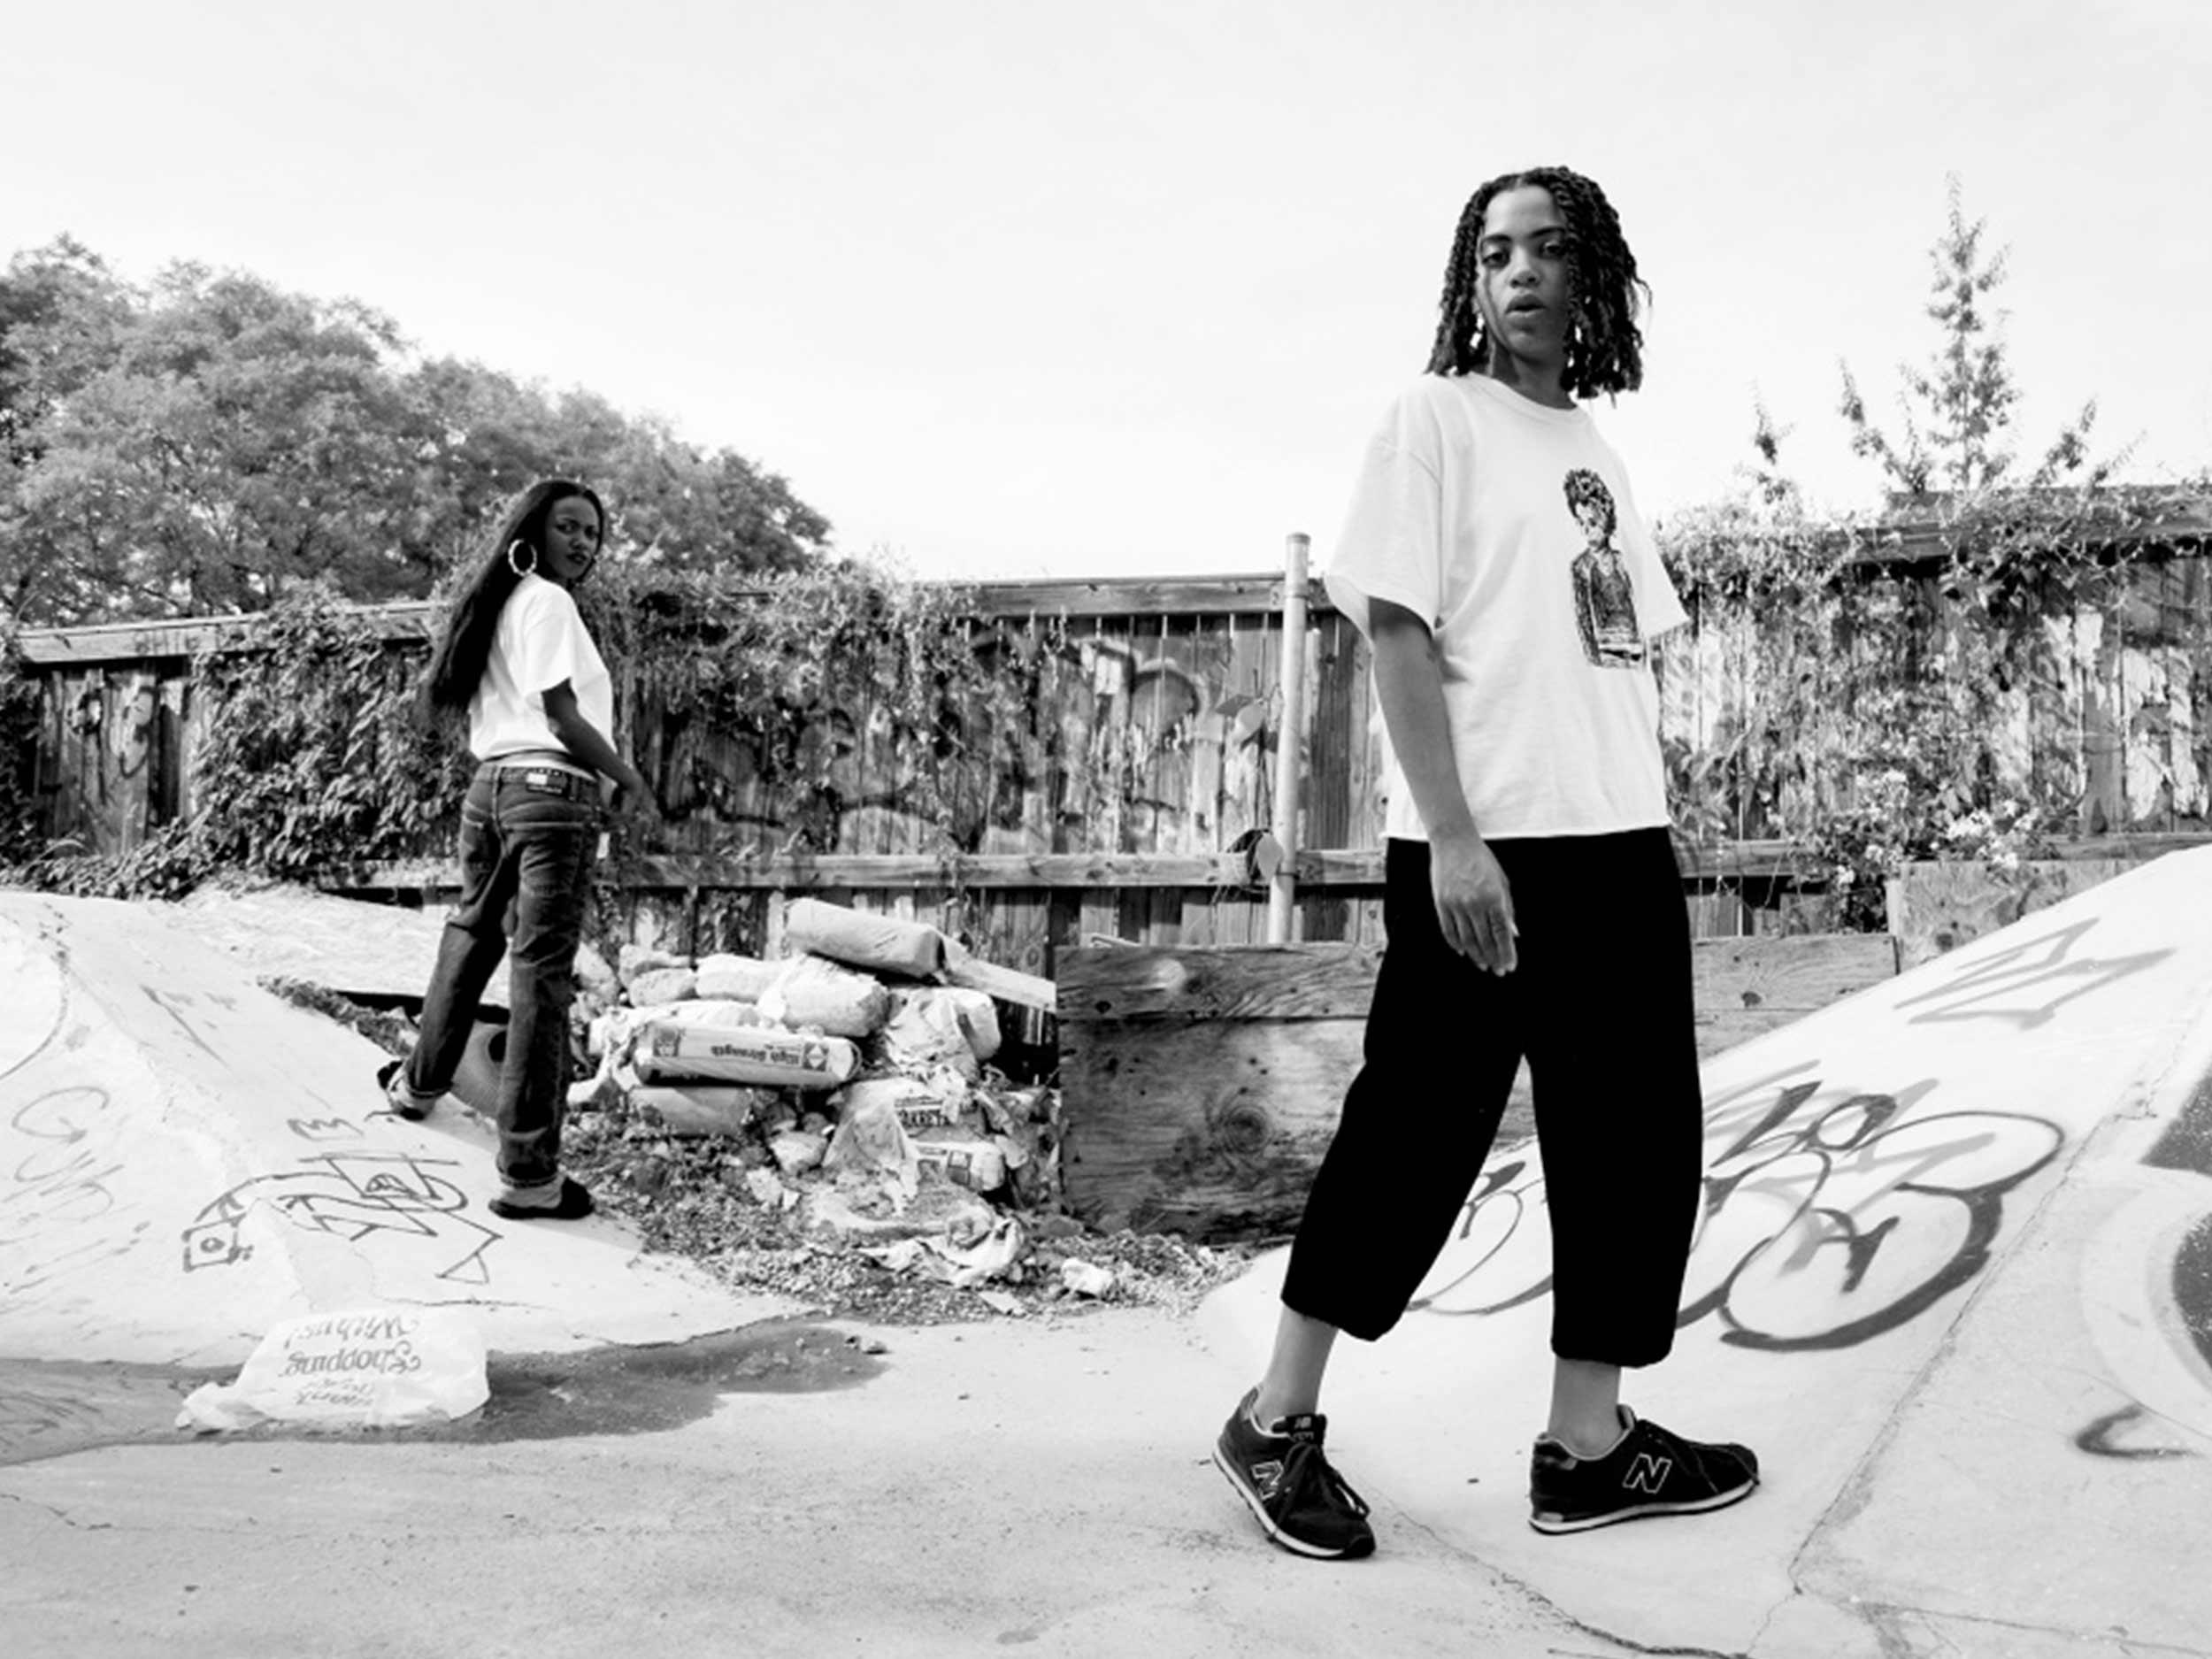 Home-grown and anti-establishment, Baltimore's creative scene is a beacon of hope